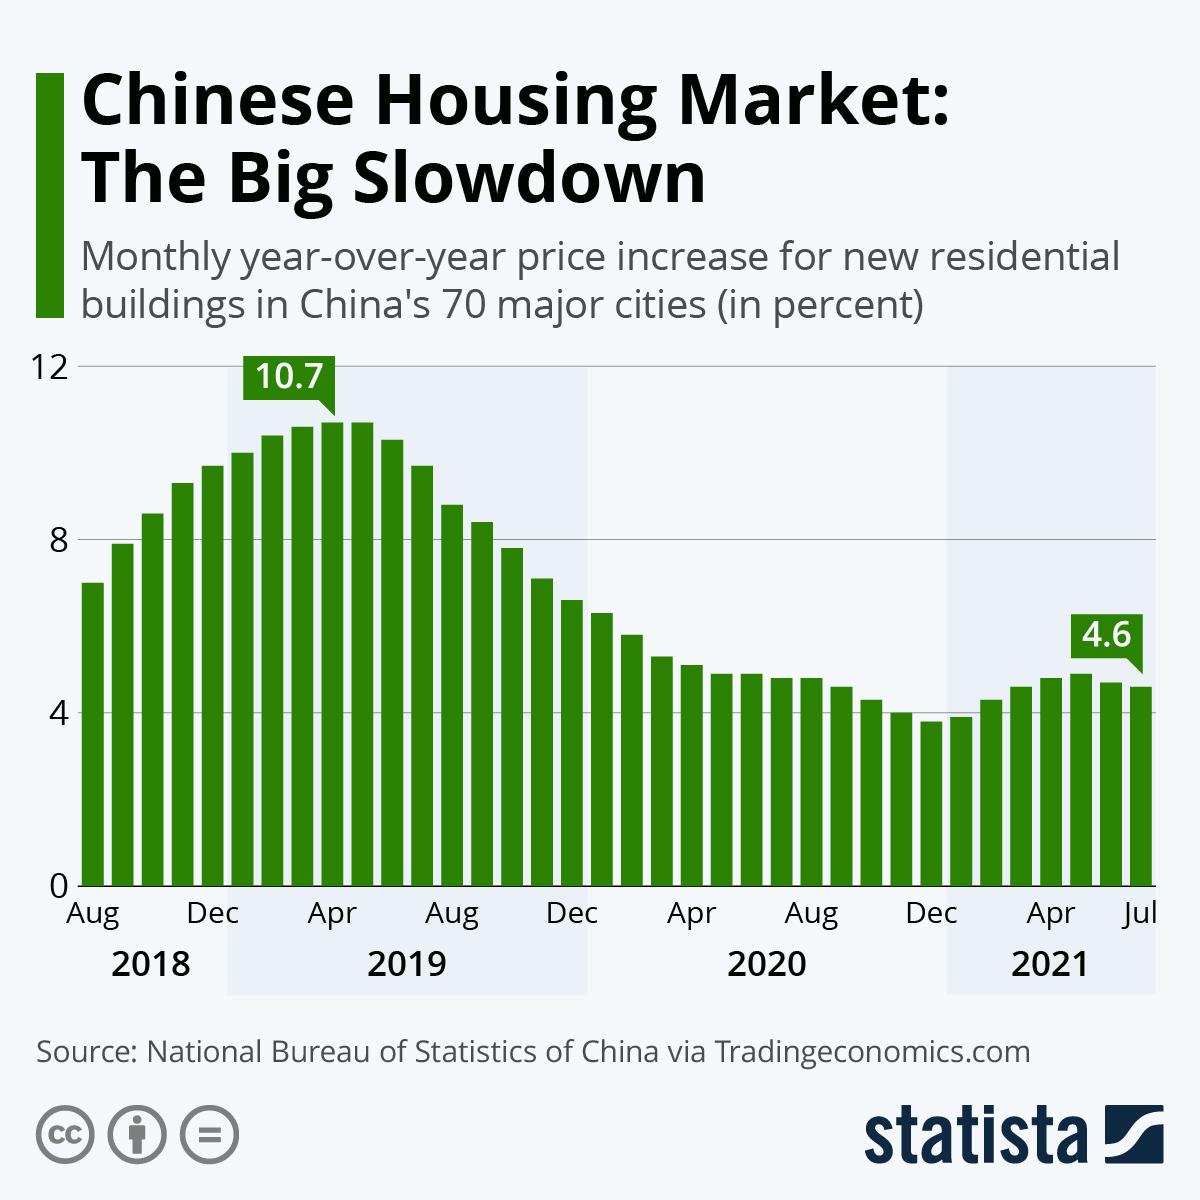 Chinese Housing Market: The Big Slowdown